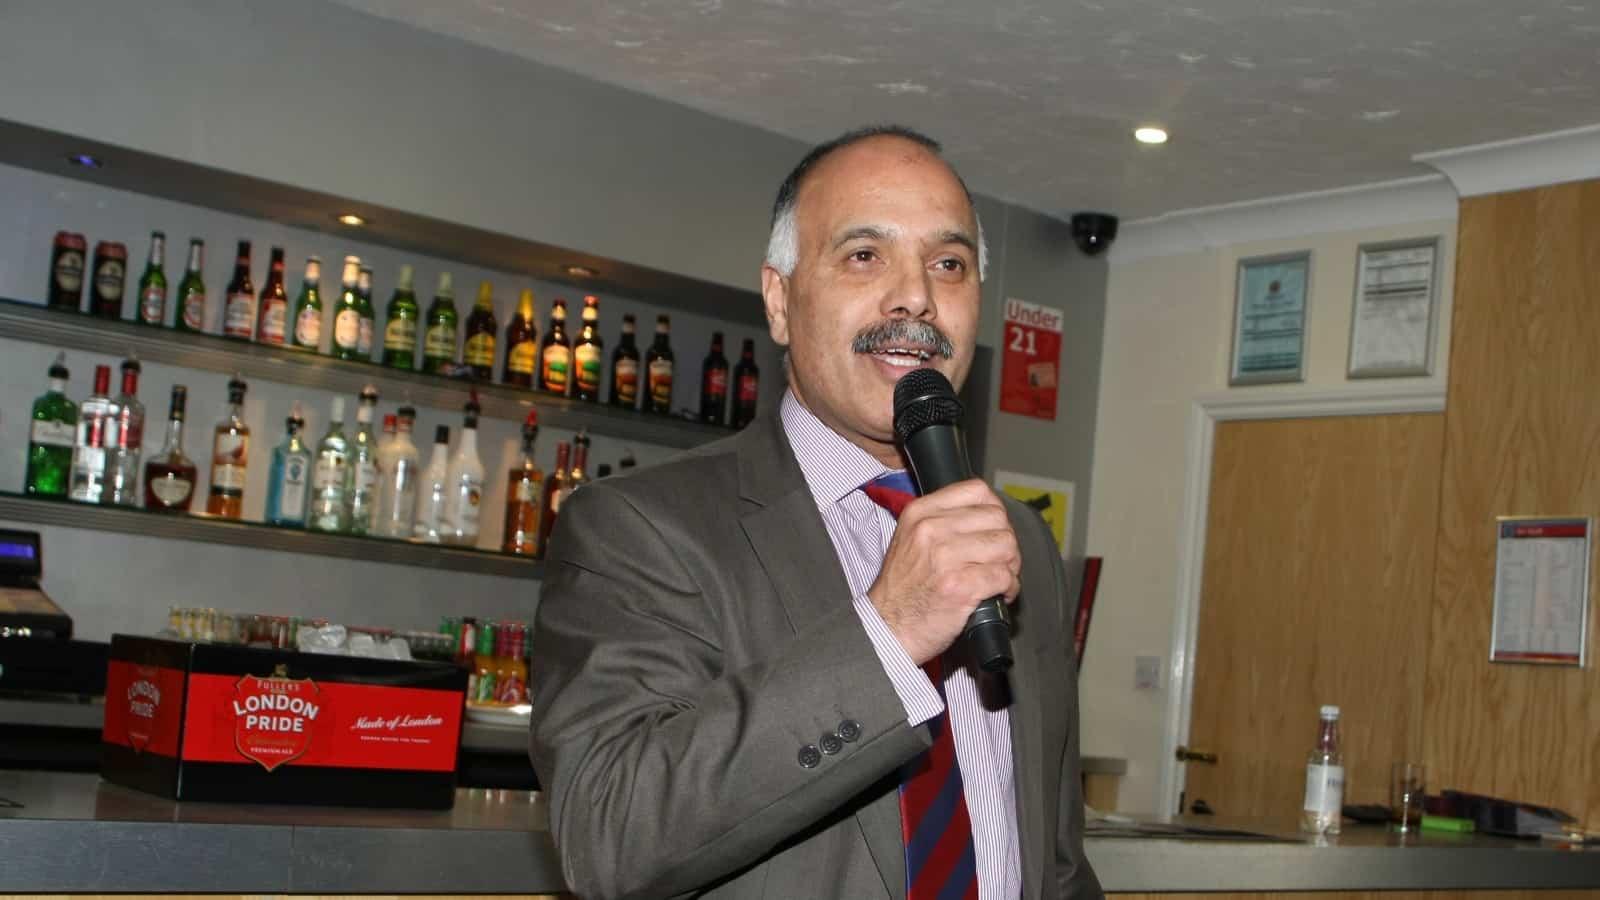 shahid azeemFEAT